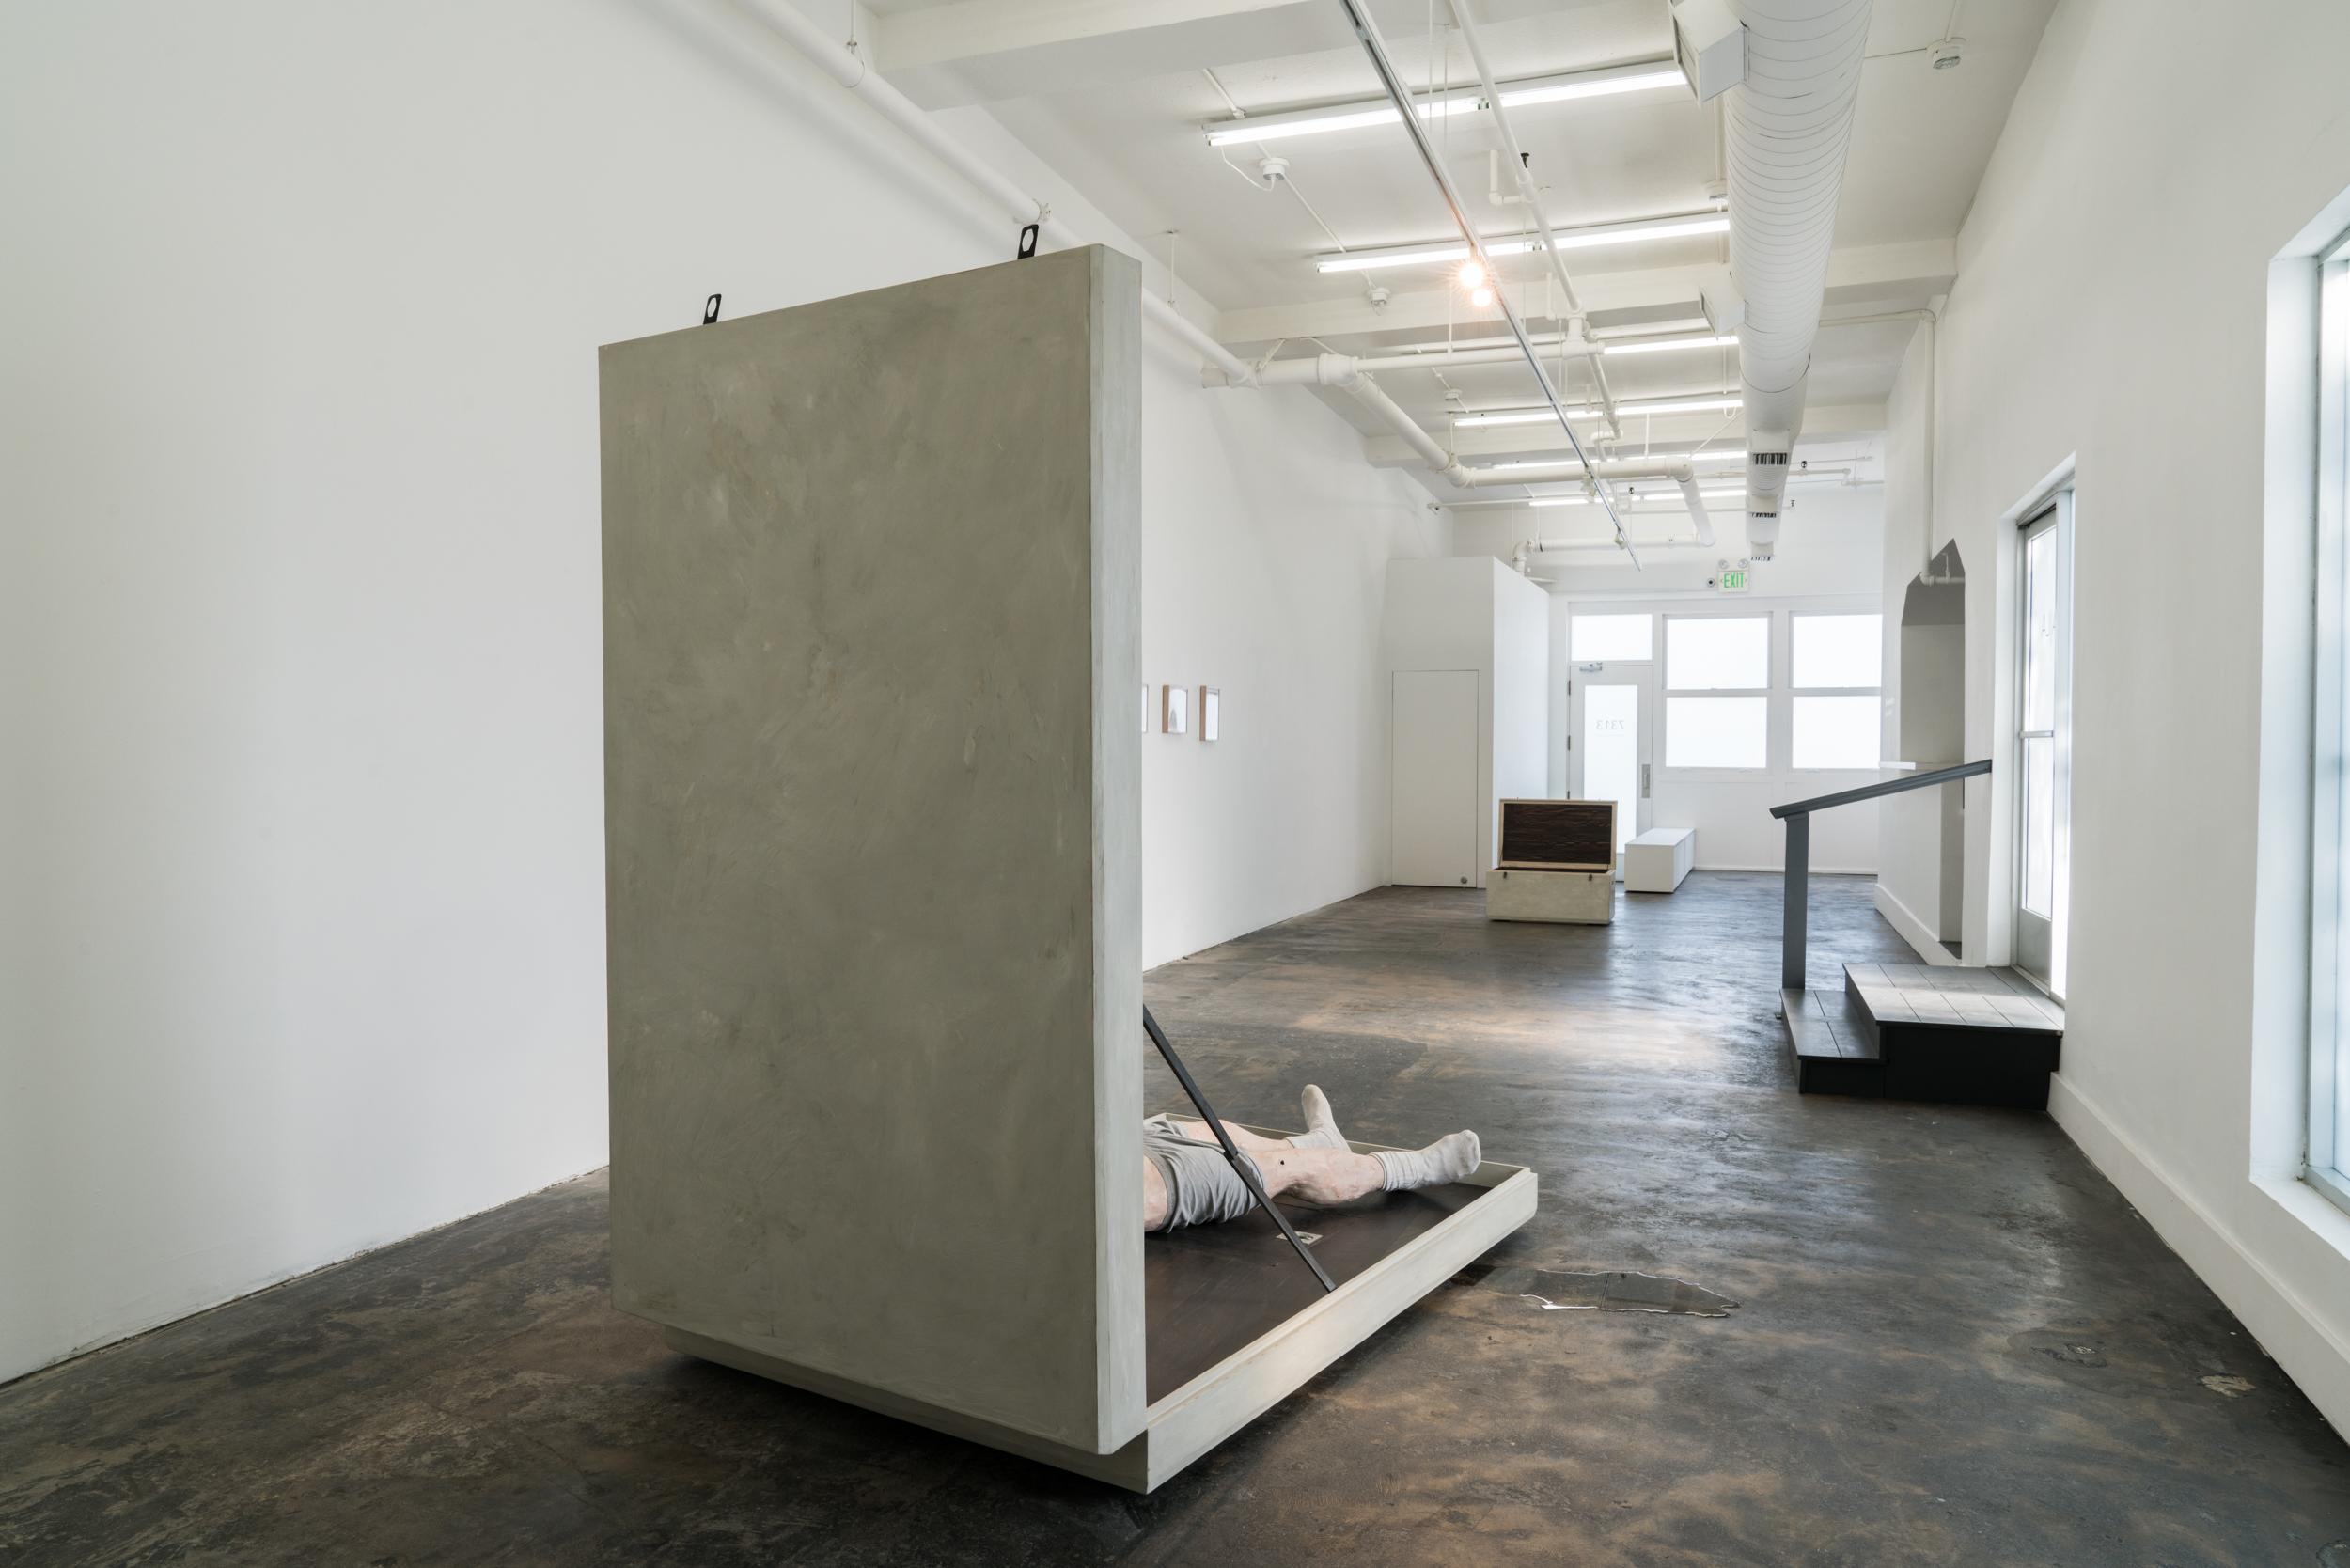 Dan Herschlein - Worm - AALA Gallery - 2016 - Install Images - Medium Res-33.jpg